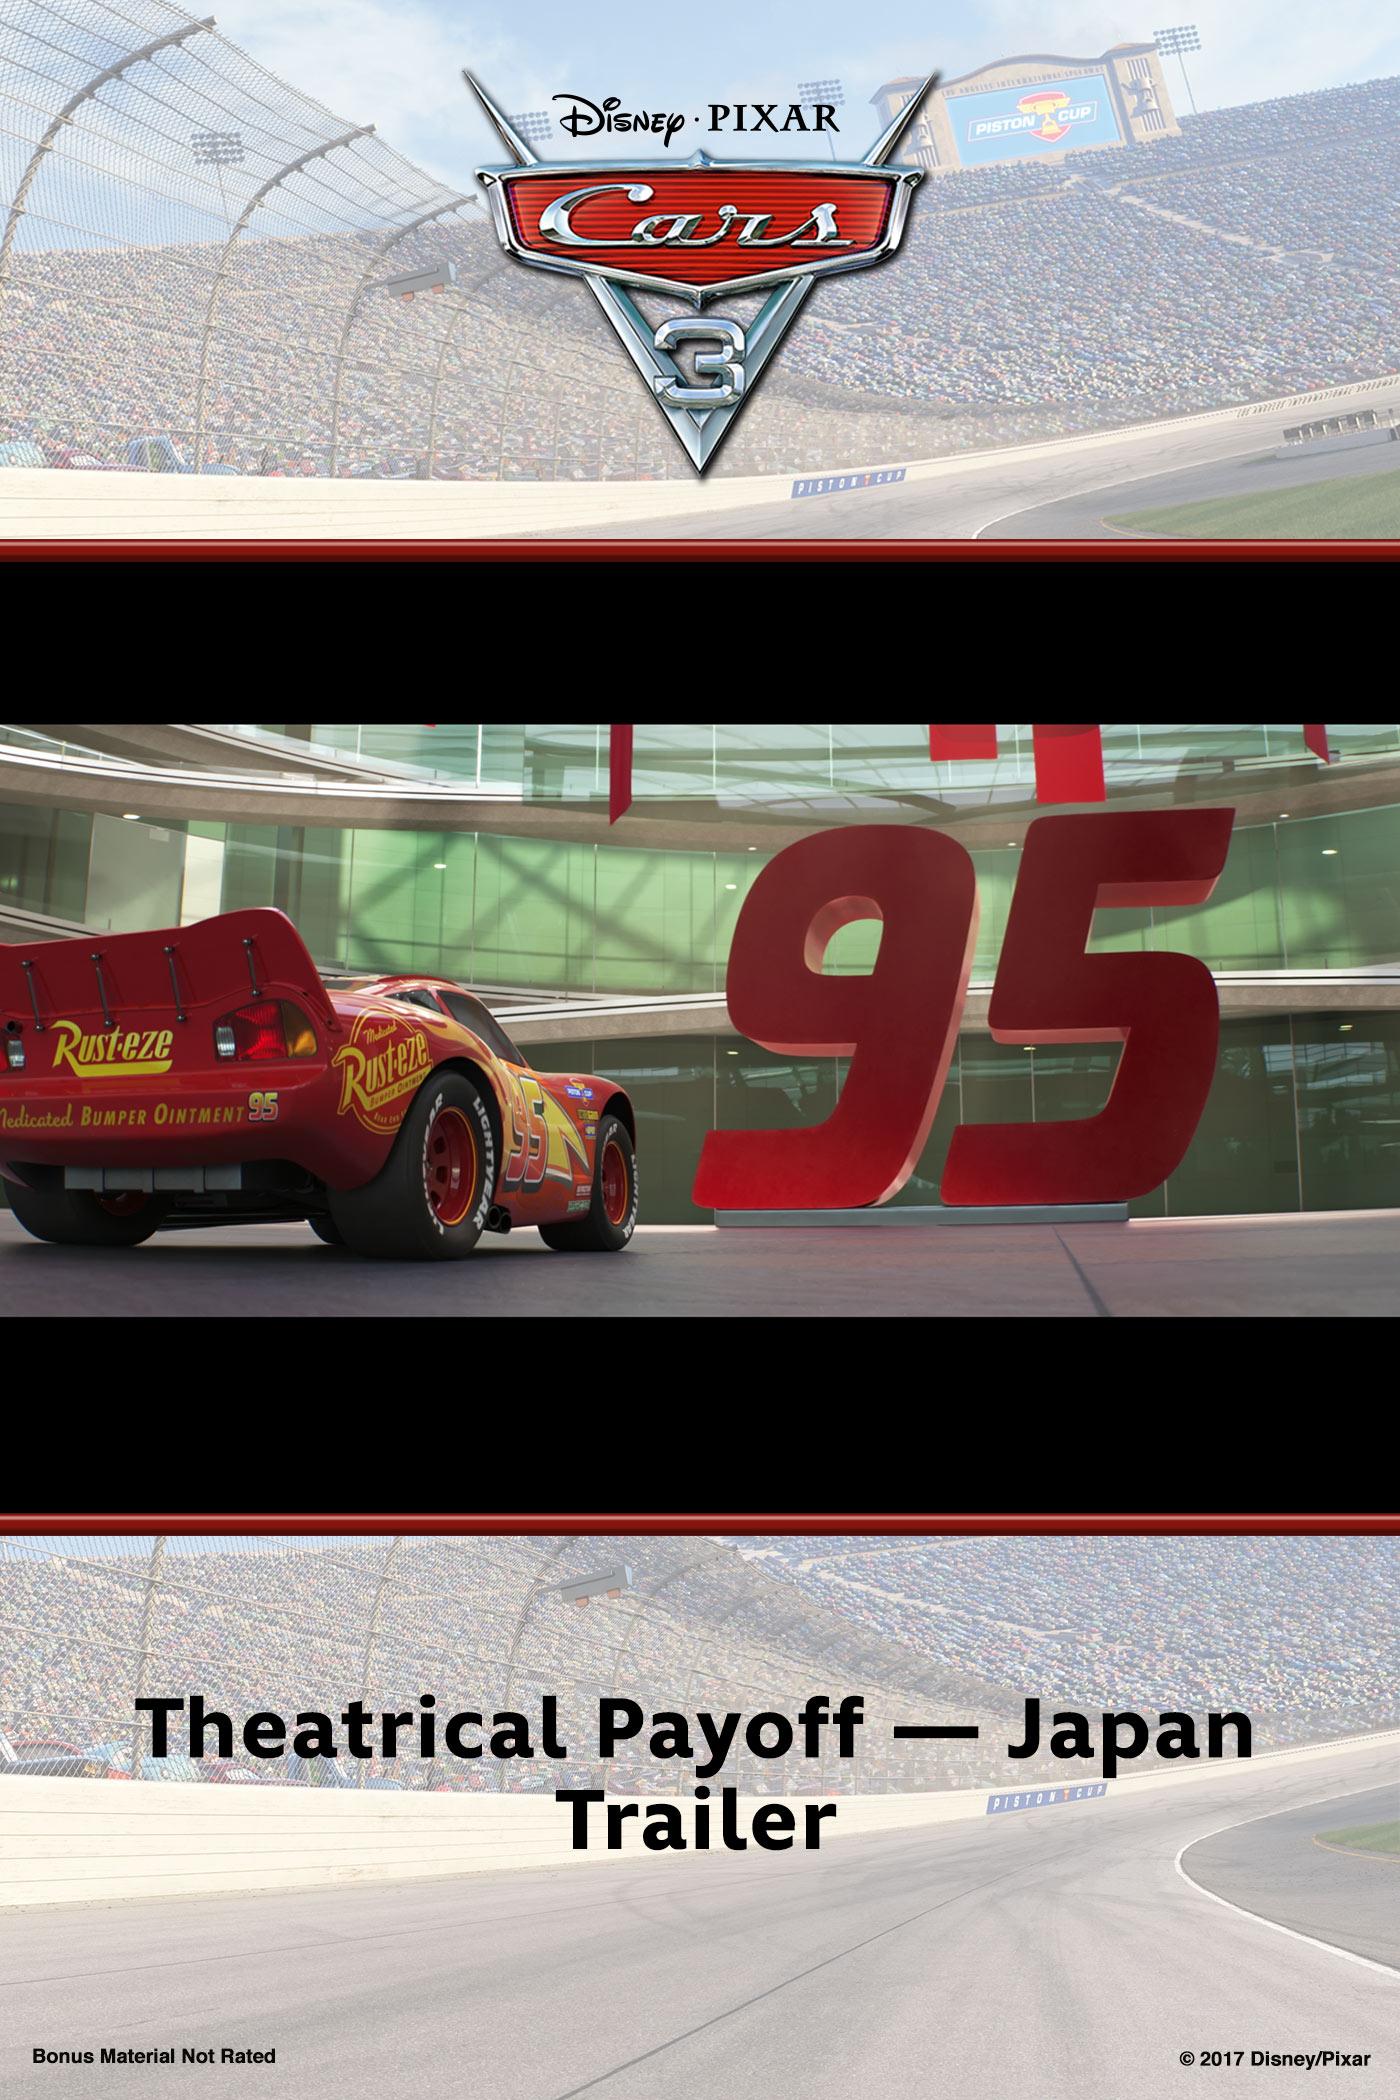 Japan Trailer